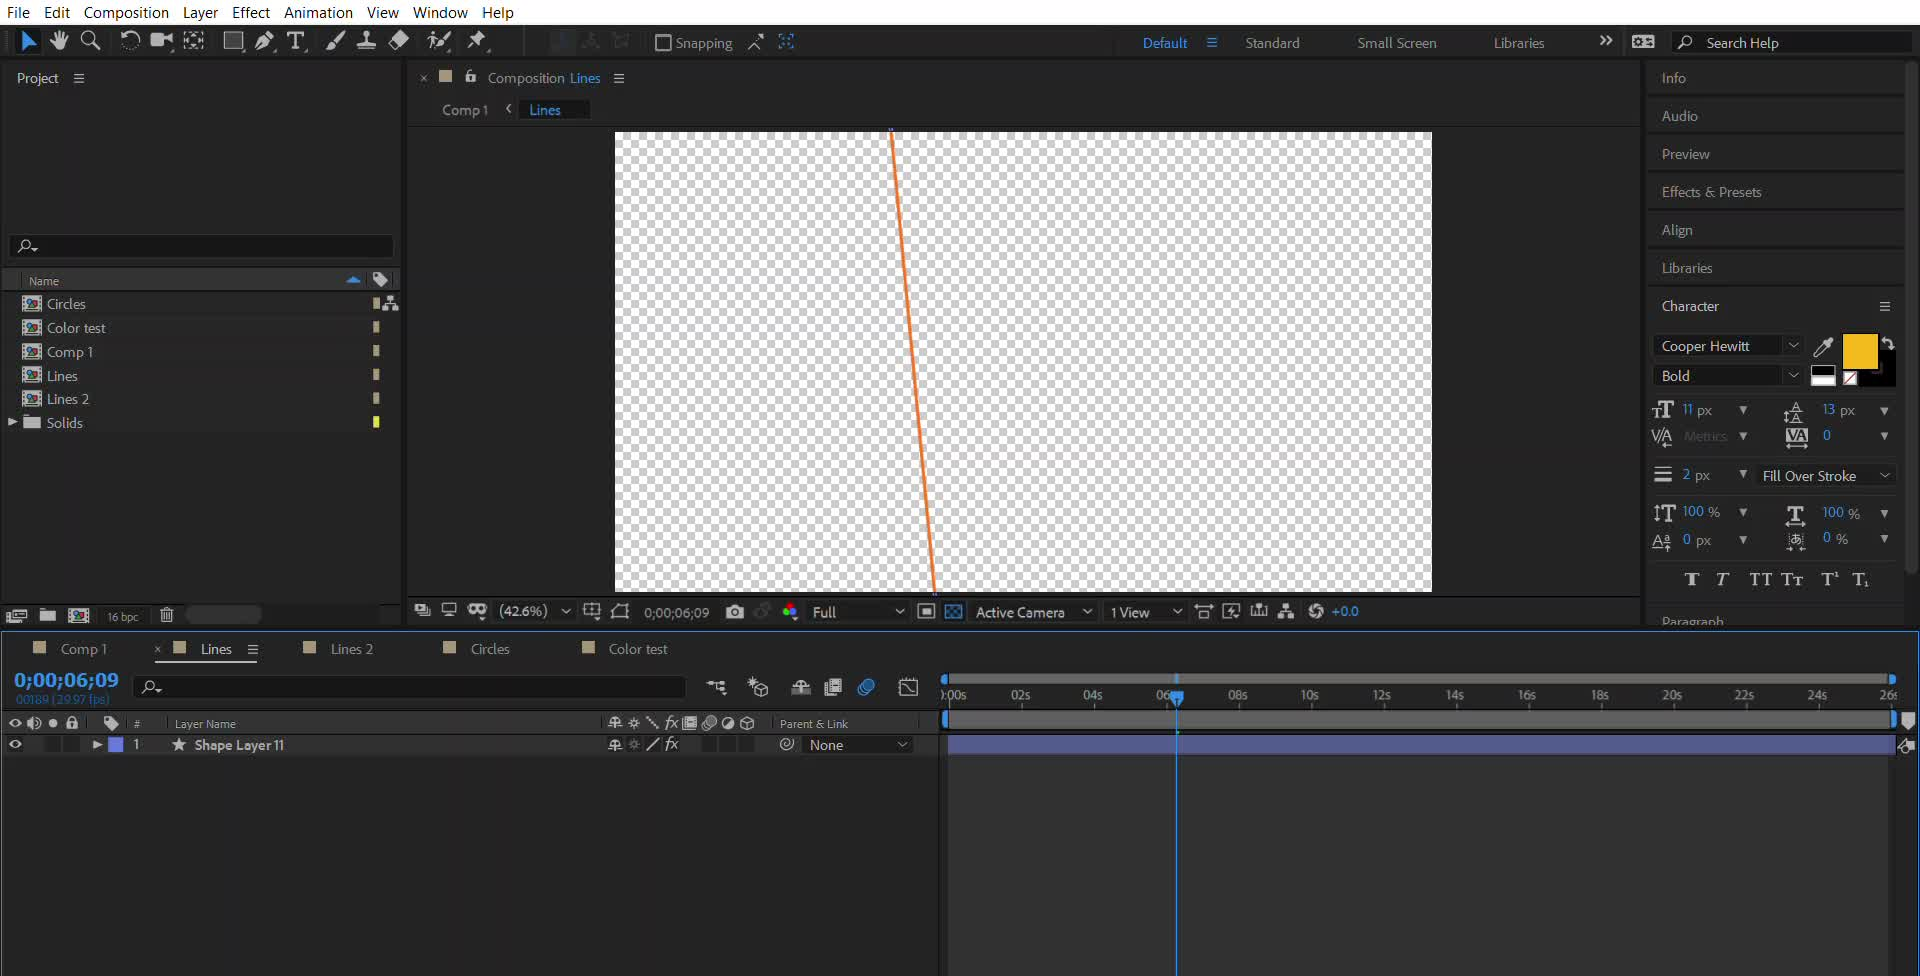 Adobe After Effects CC 2018 C Users Jormu Dropbox Videos Backups Copied  Untitled Hime Bg Folder Hime Bg Aep 5 2 2018 9 06 27 PM